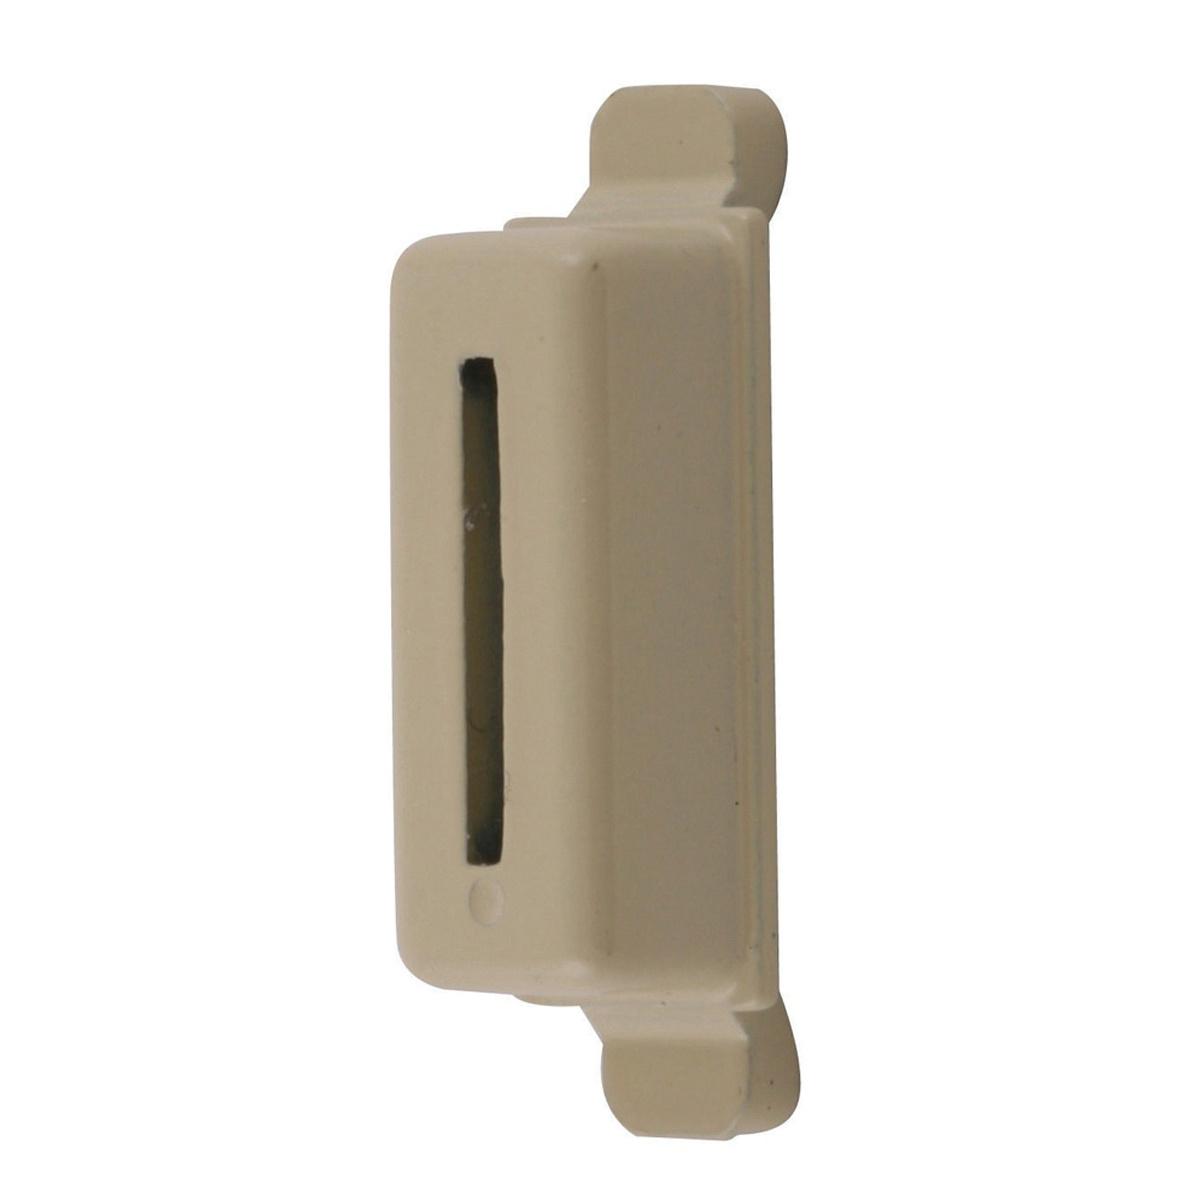 Hubbell-Wiring HBL1201LI 120 - 277-Volt AC 15-Amp 1-Pole Extra Heavy-Duty on